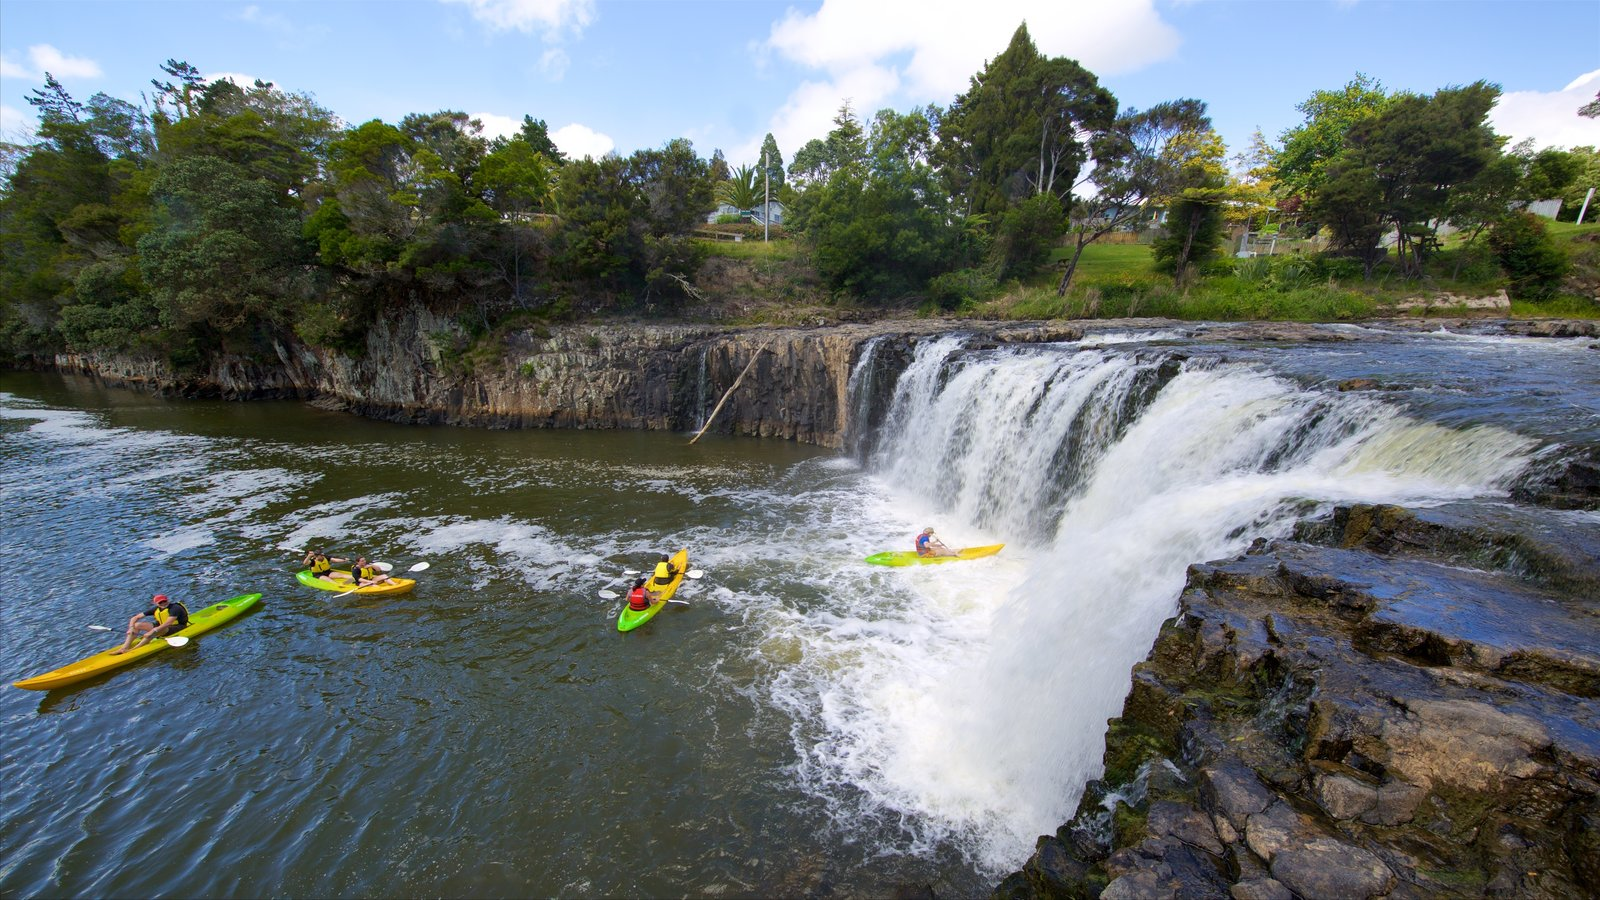 Paihia mostrando kayak o canoa, un río o arroyo y una catarata